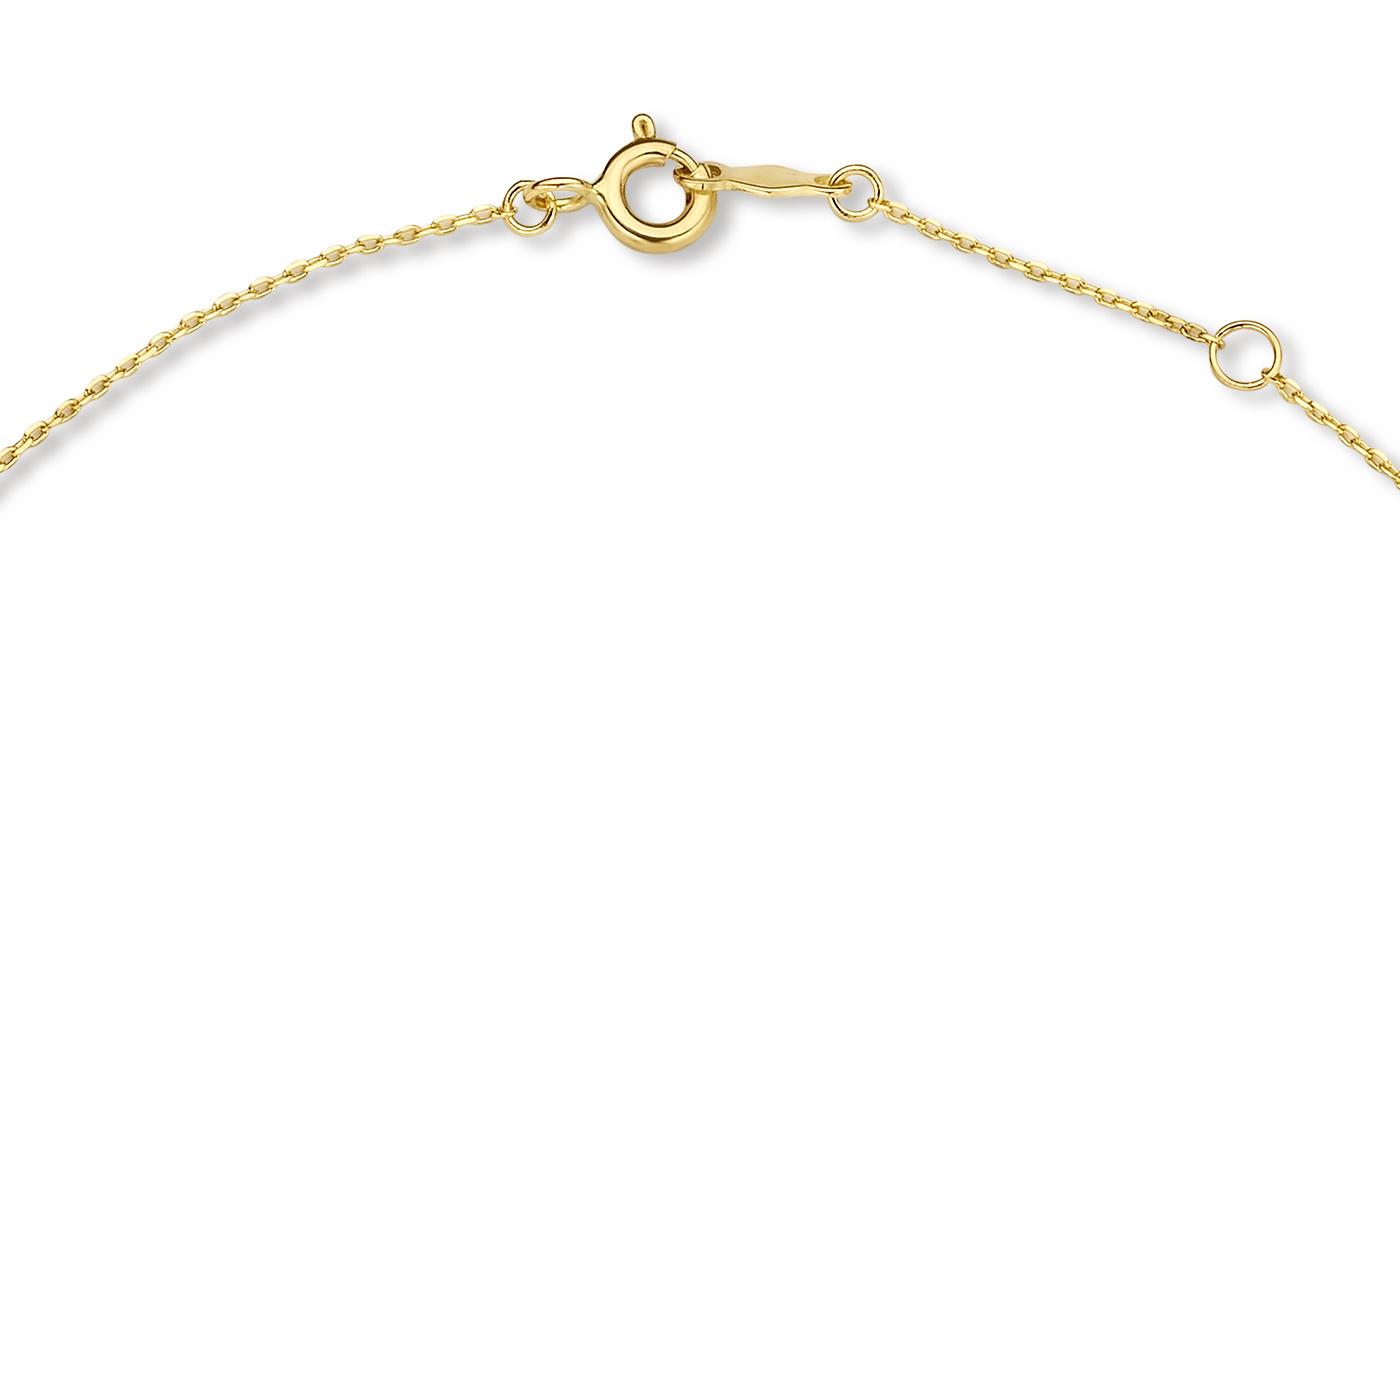 Isabel Bernard Le Marais Dauphine 14 karat guld collier stav